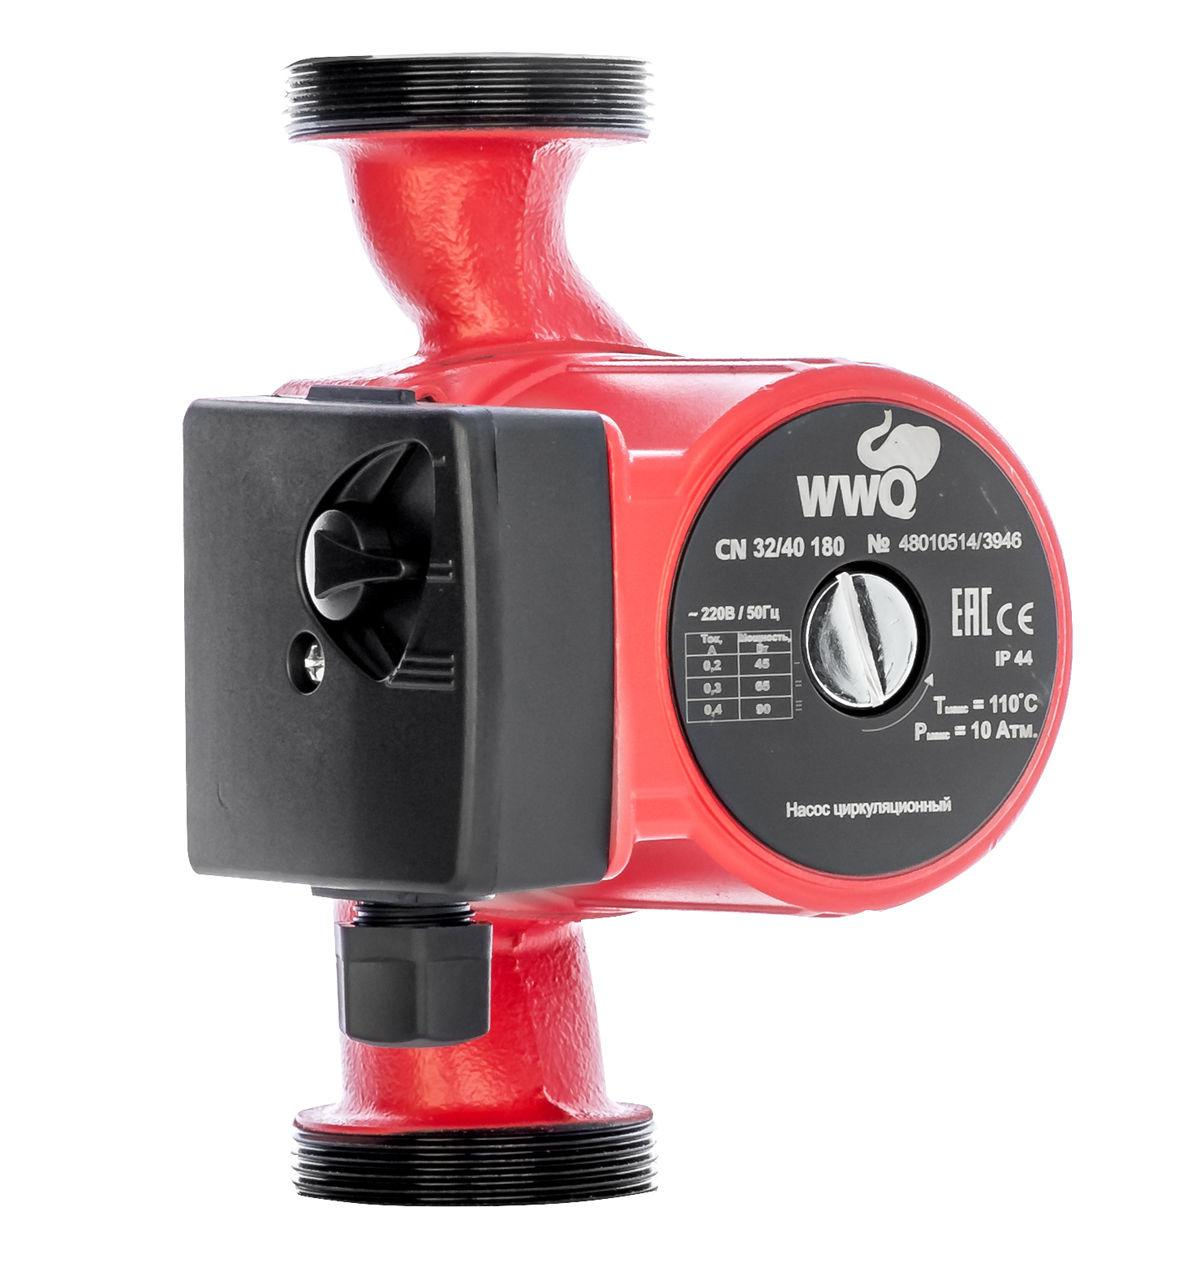 Циркуляционный насос Wwq Cn 32/60-180 циркуляционный насос wwq cn 25 40 180